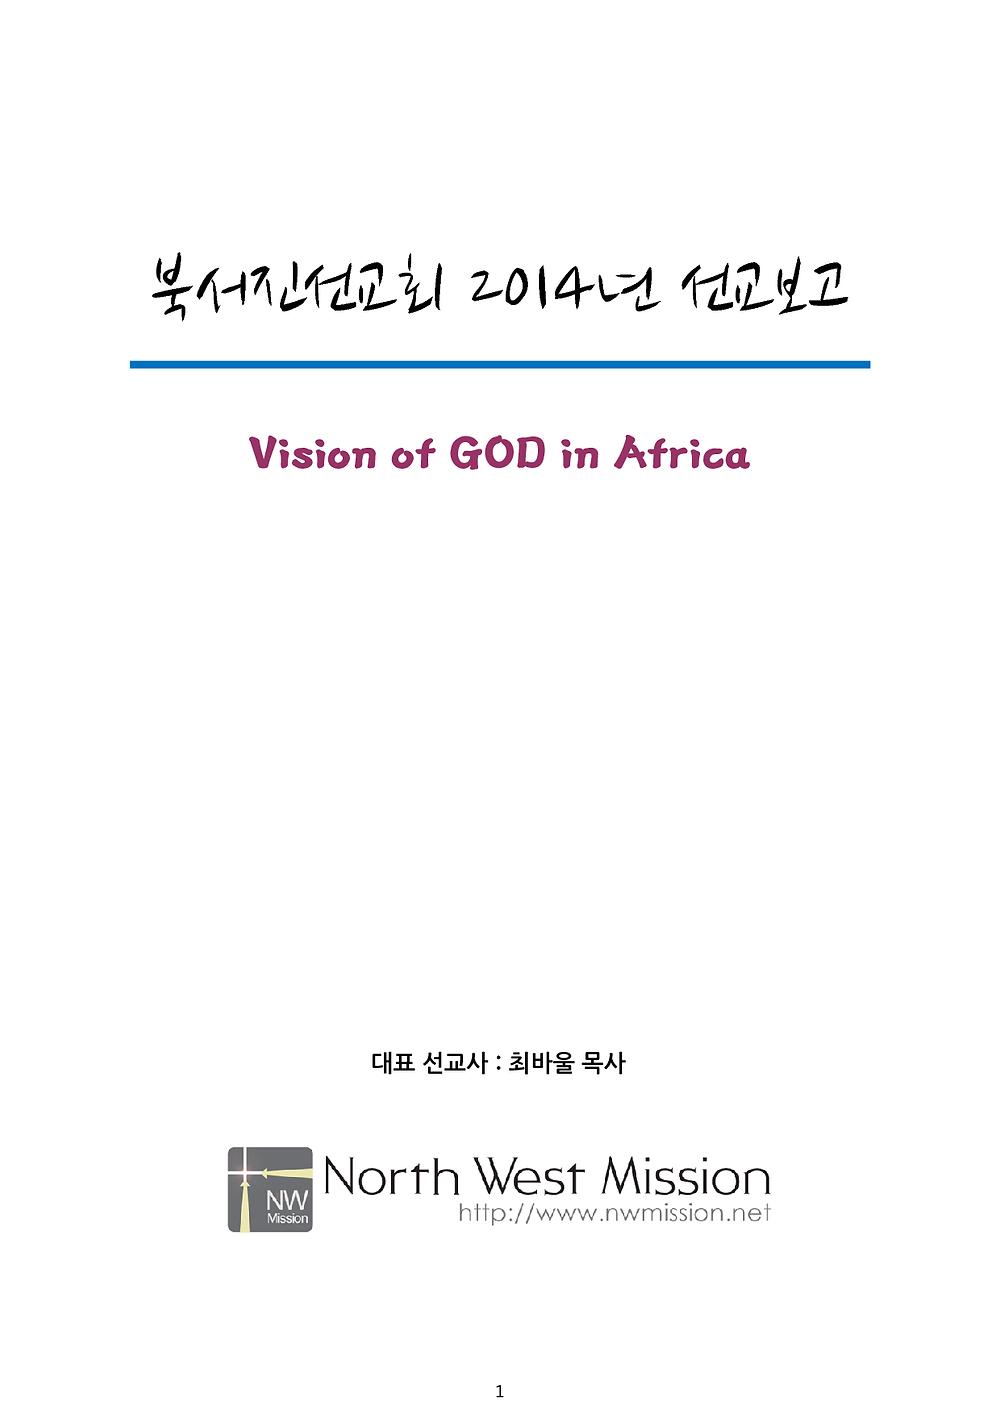 NWM 2014년 선교보고_1.png